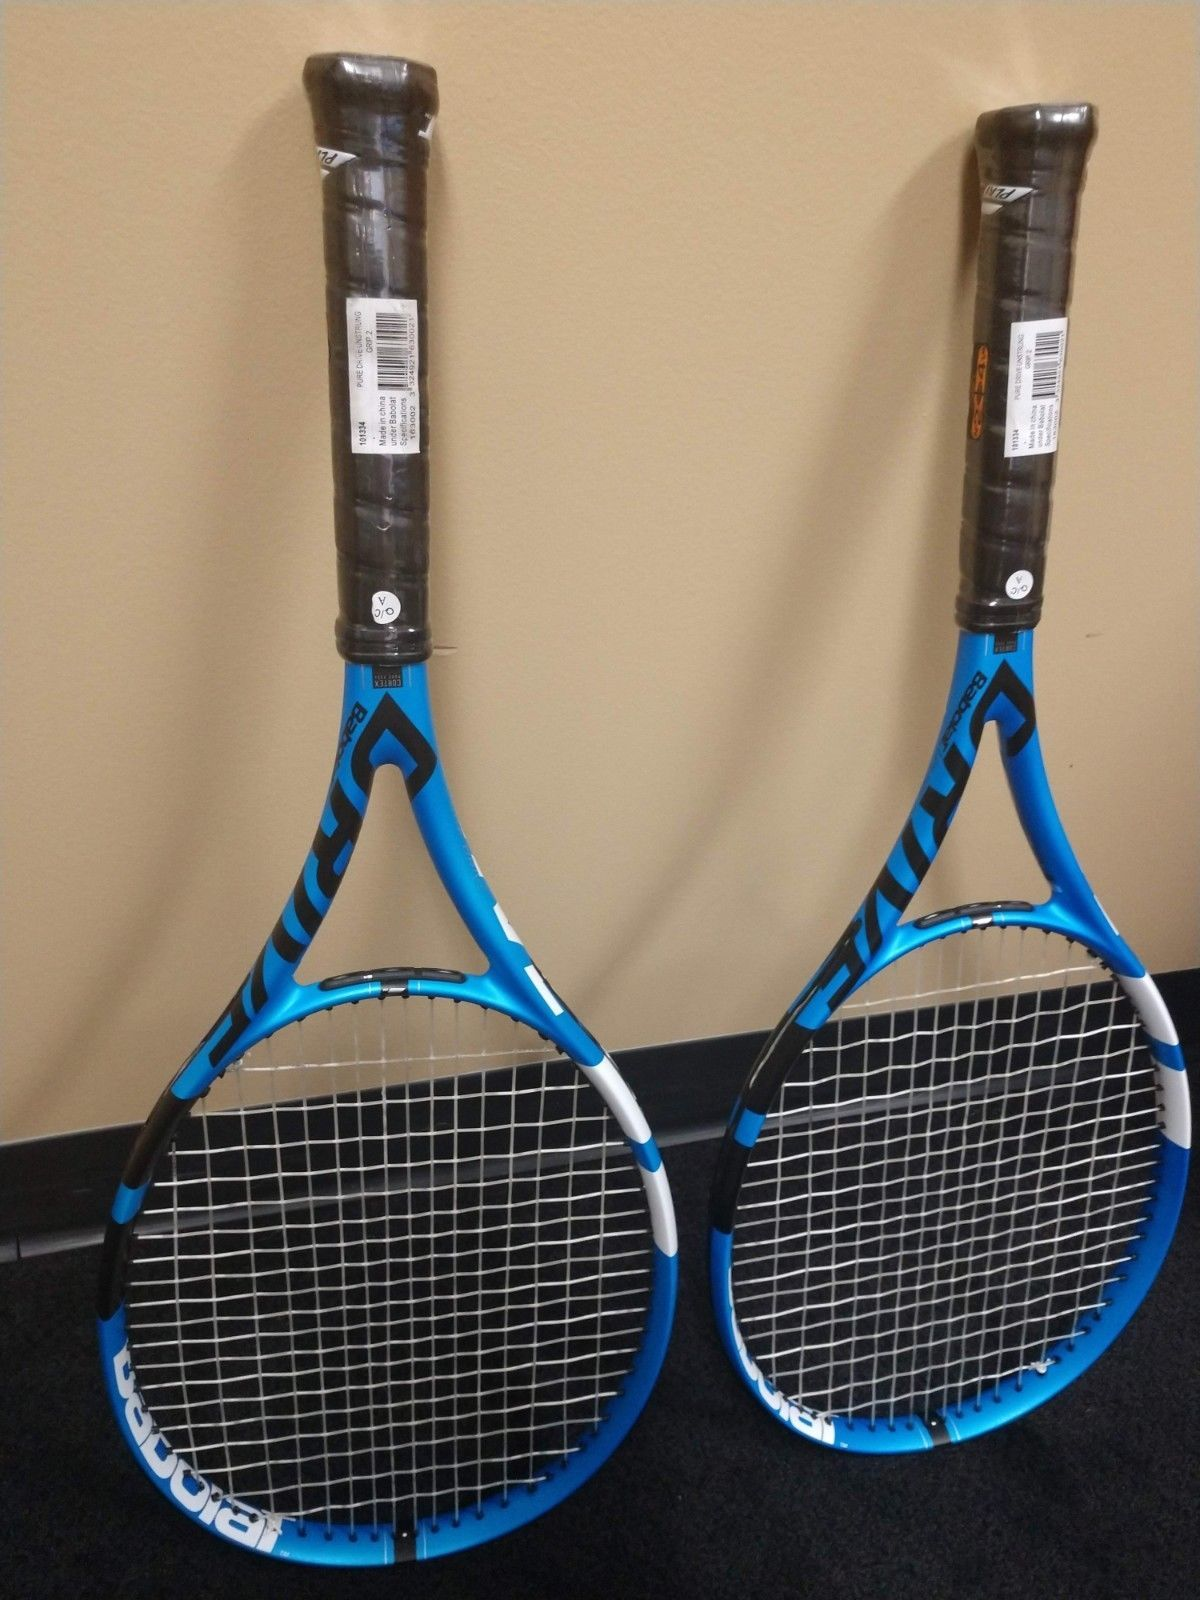 Reviews For The Best Tennis Racquets Tennis, Best tennis